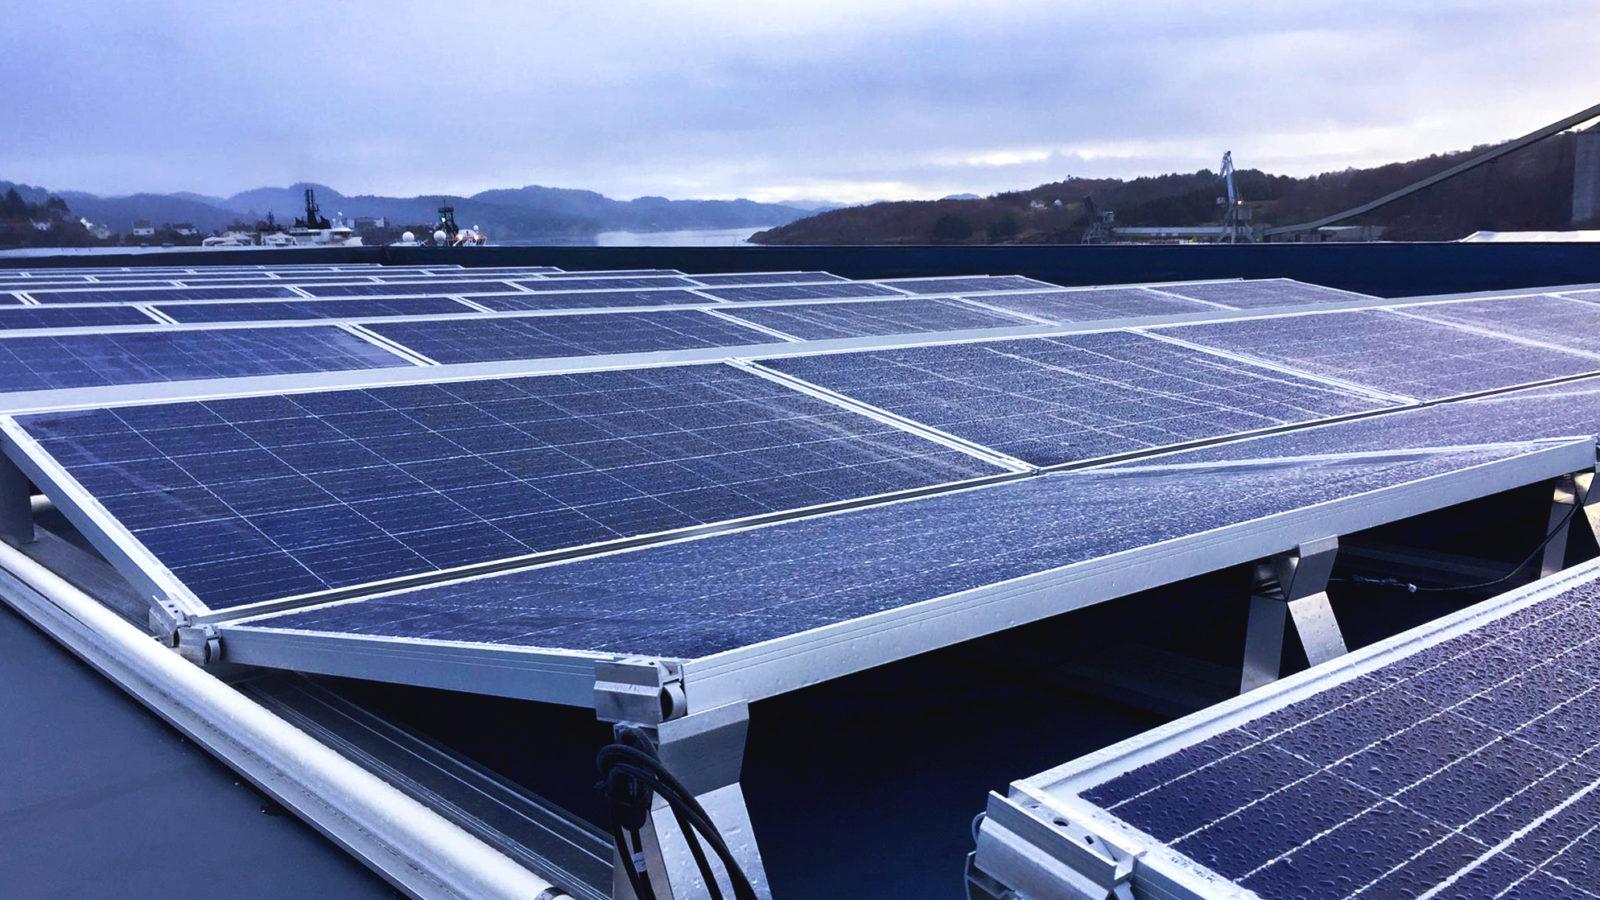 Solcelleanlegg på eget kontorbygg